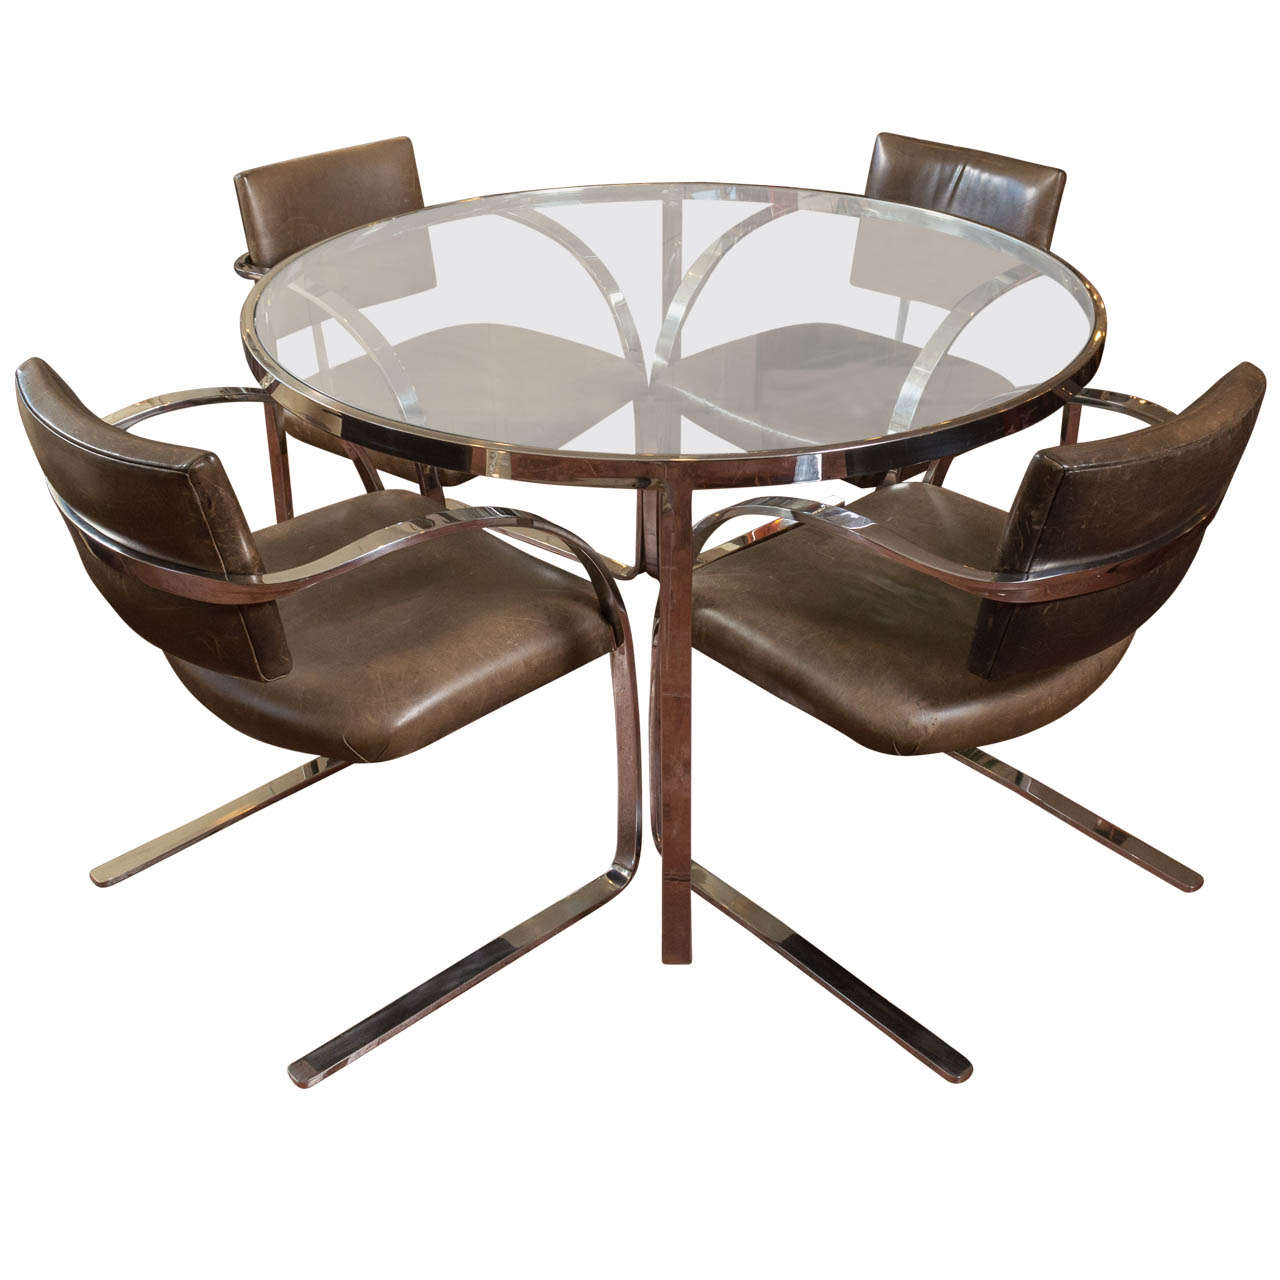 mark mascheroni for brueton stainless steel dining set at